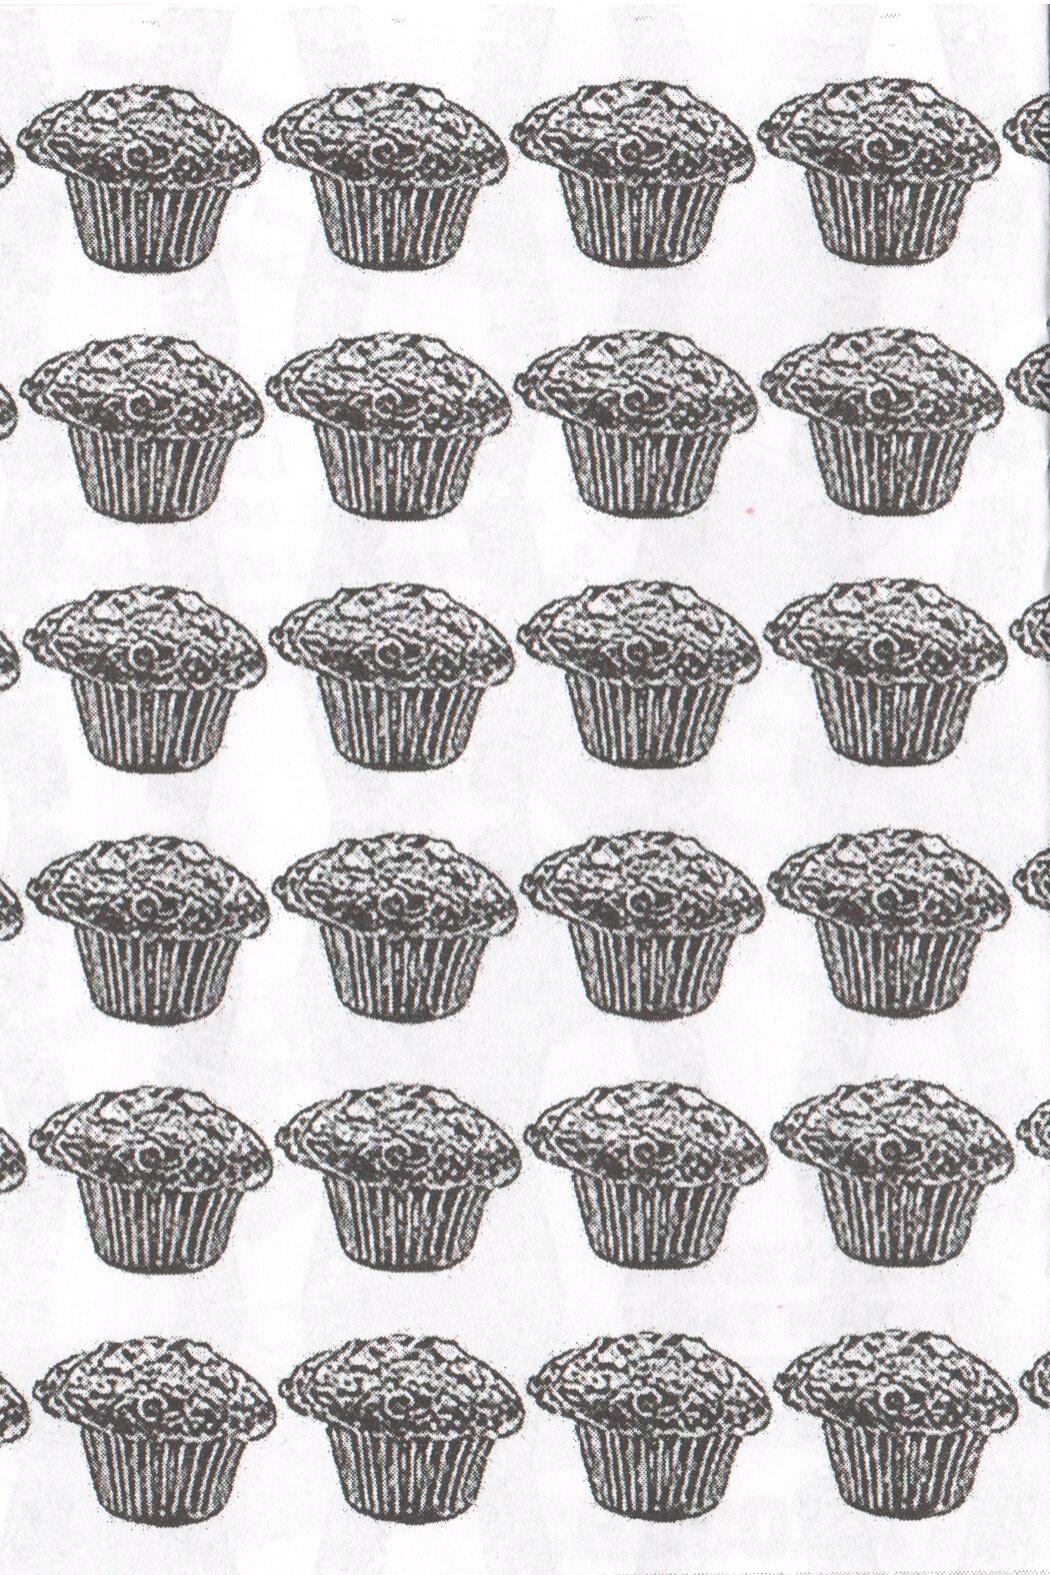 Chocolate_Page_6_Image_0001.jpg